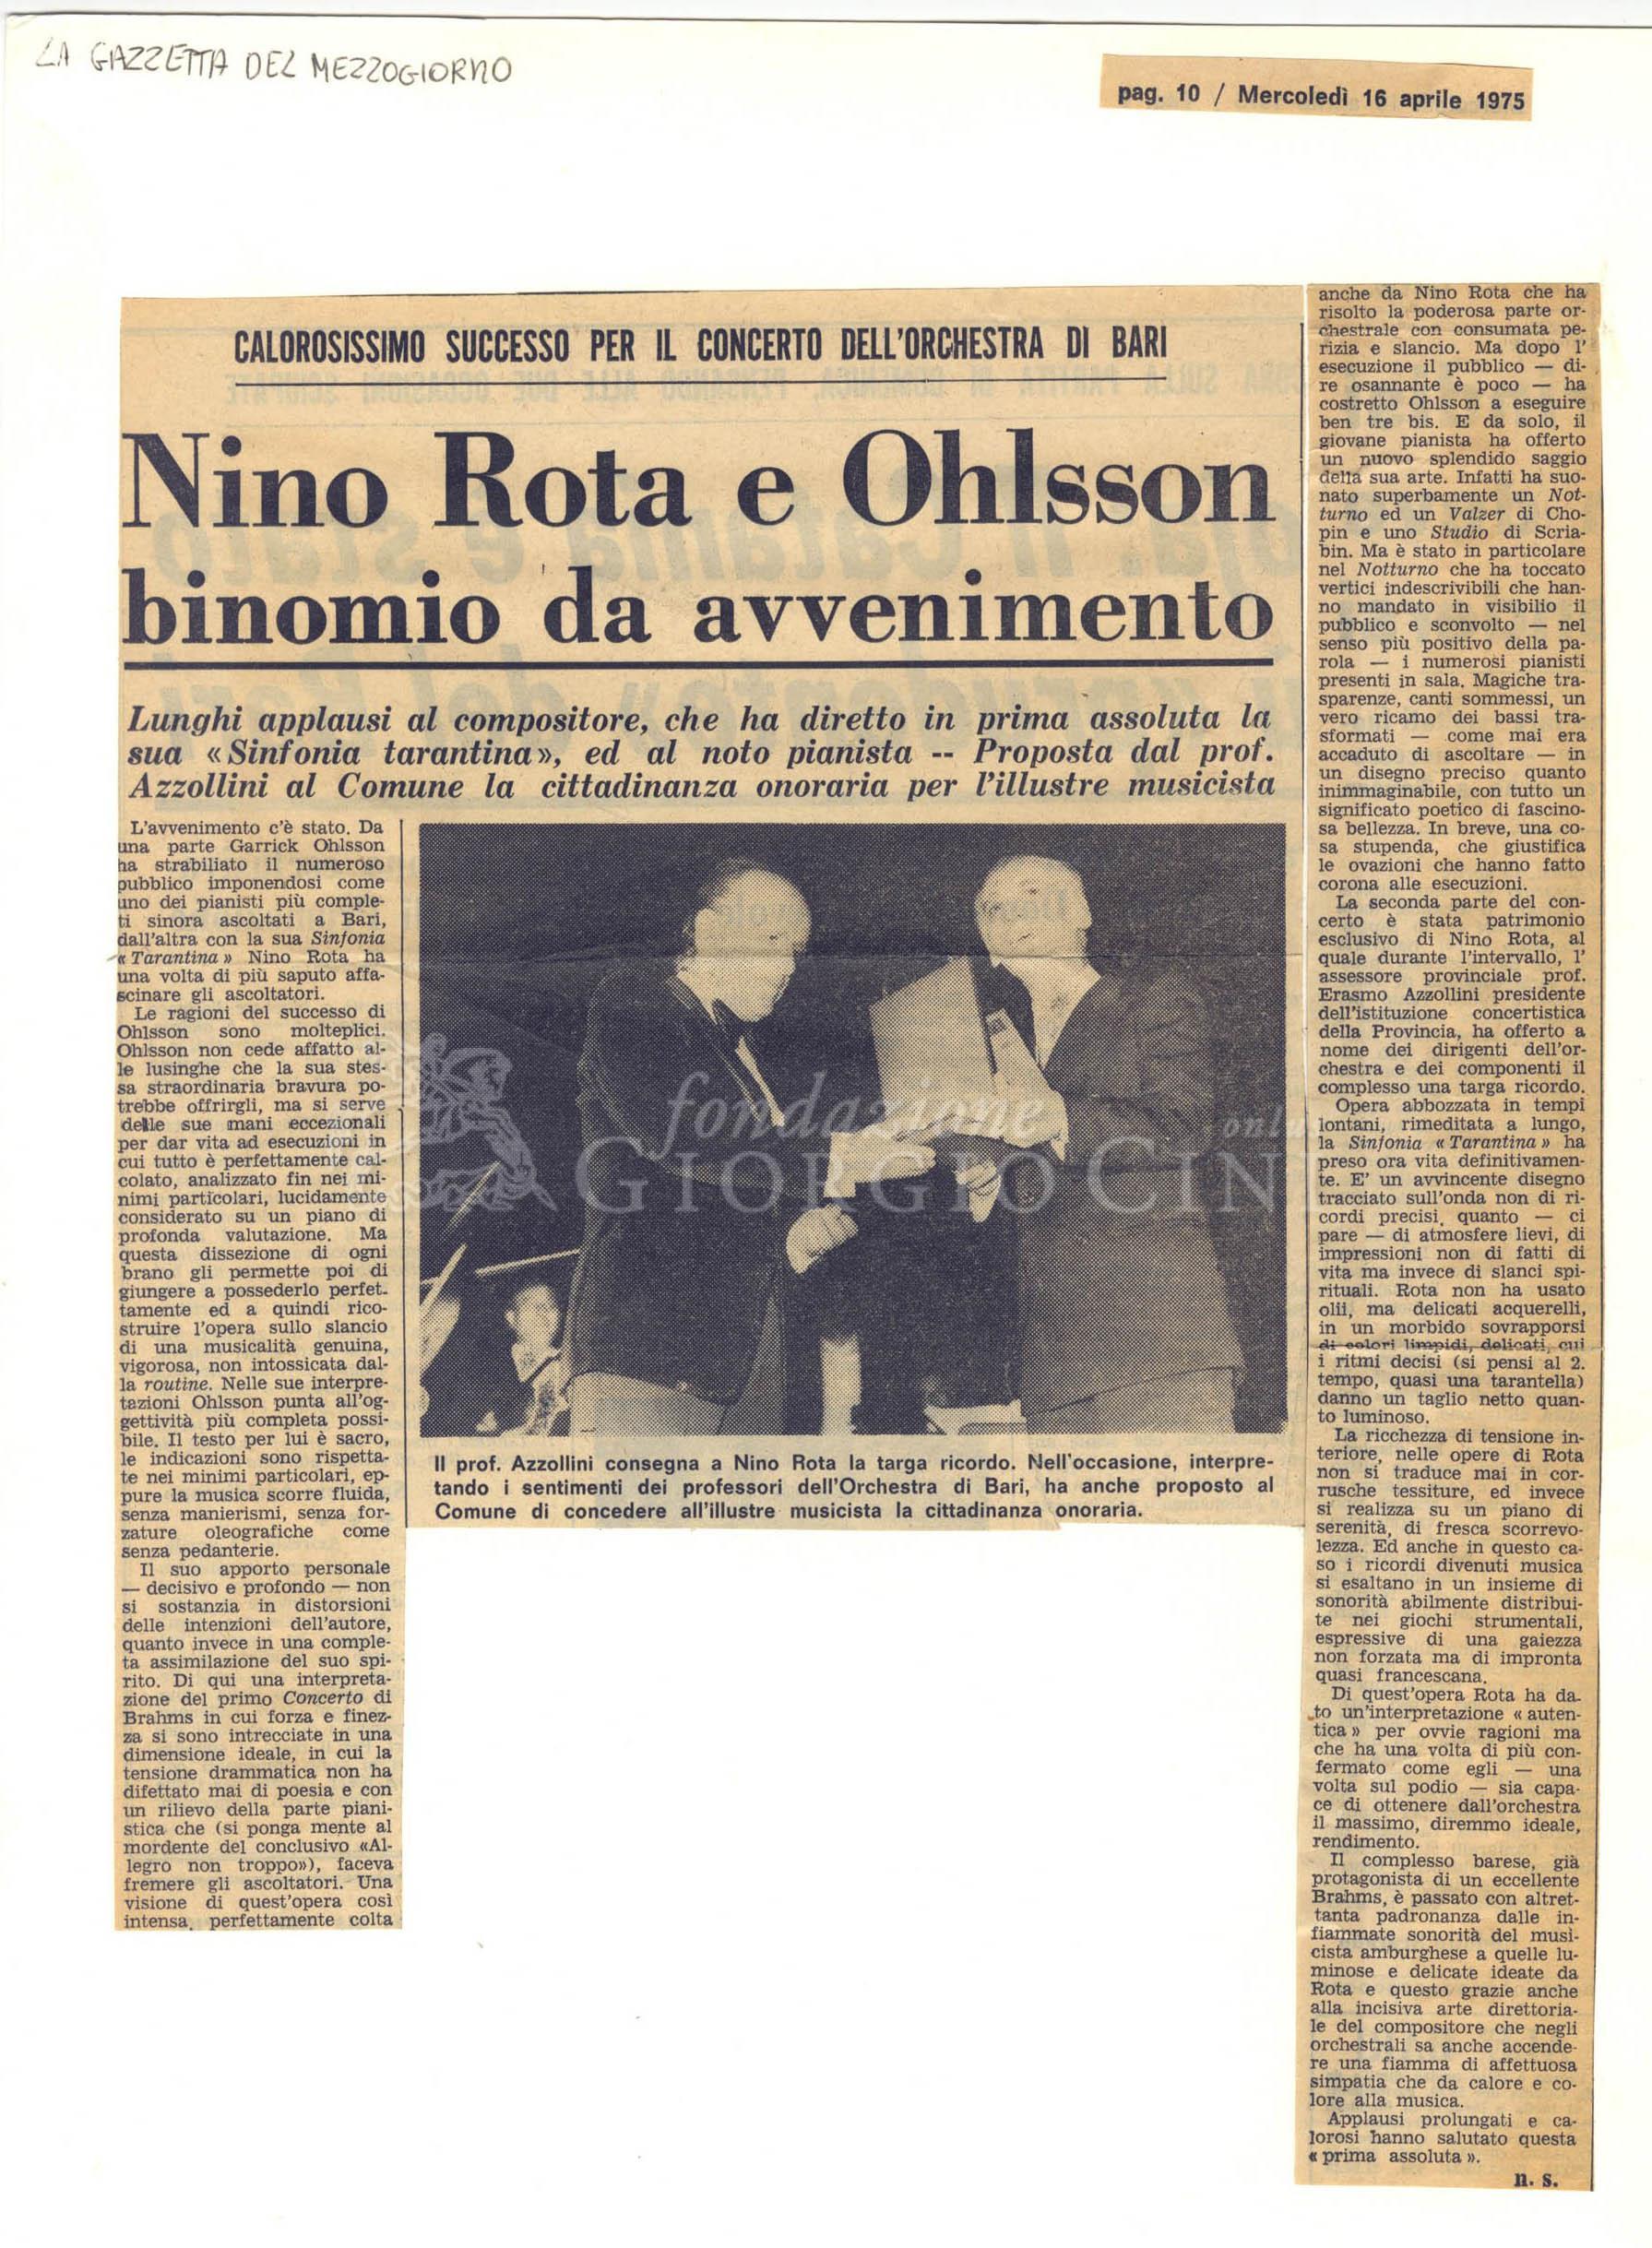 Nino Rota e Ohlsson binomio da avvenimento  16 aprile 1975